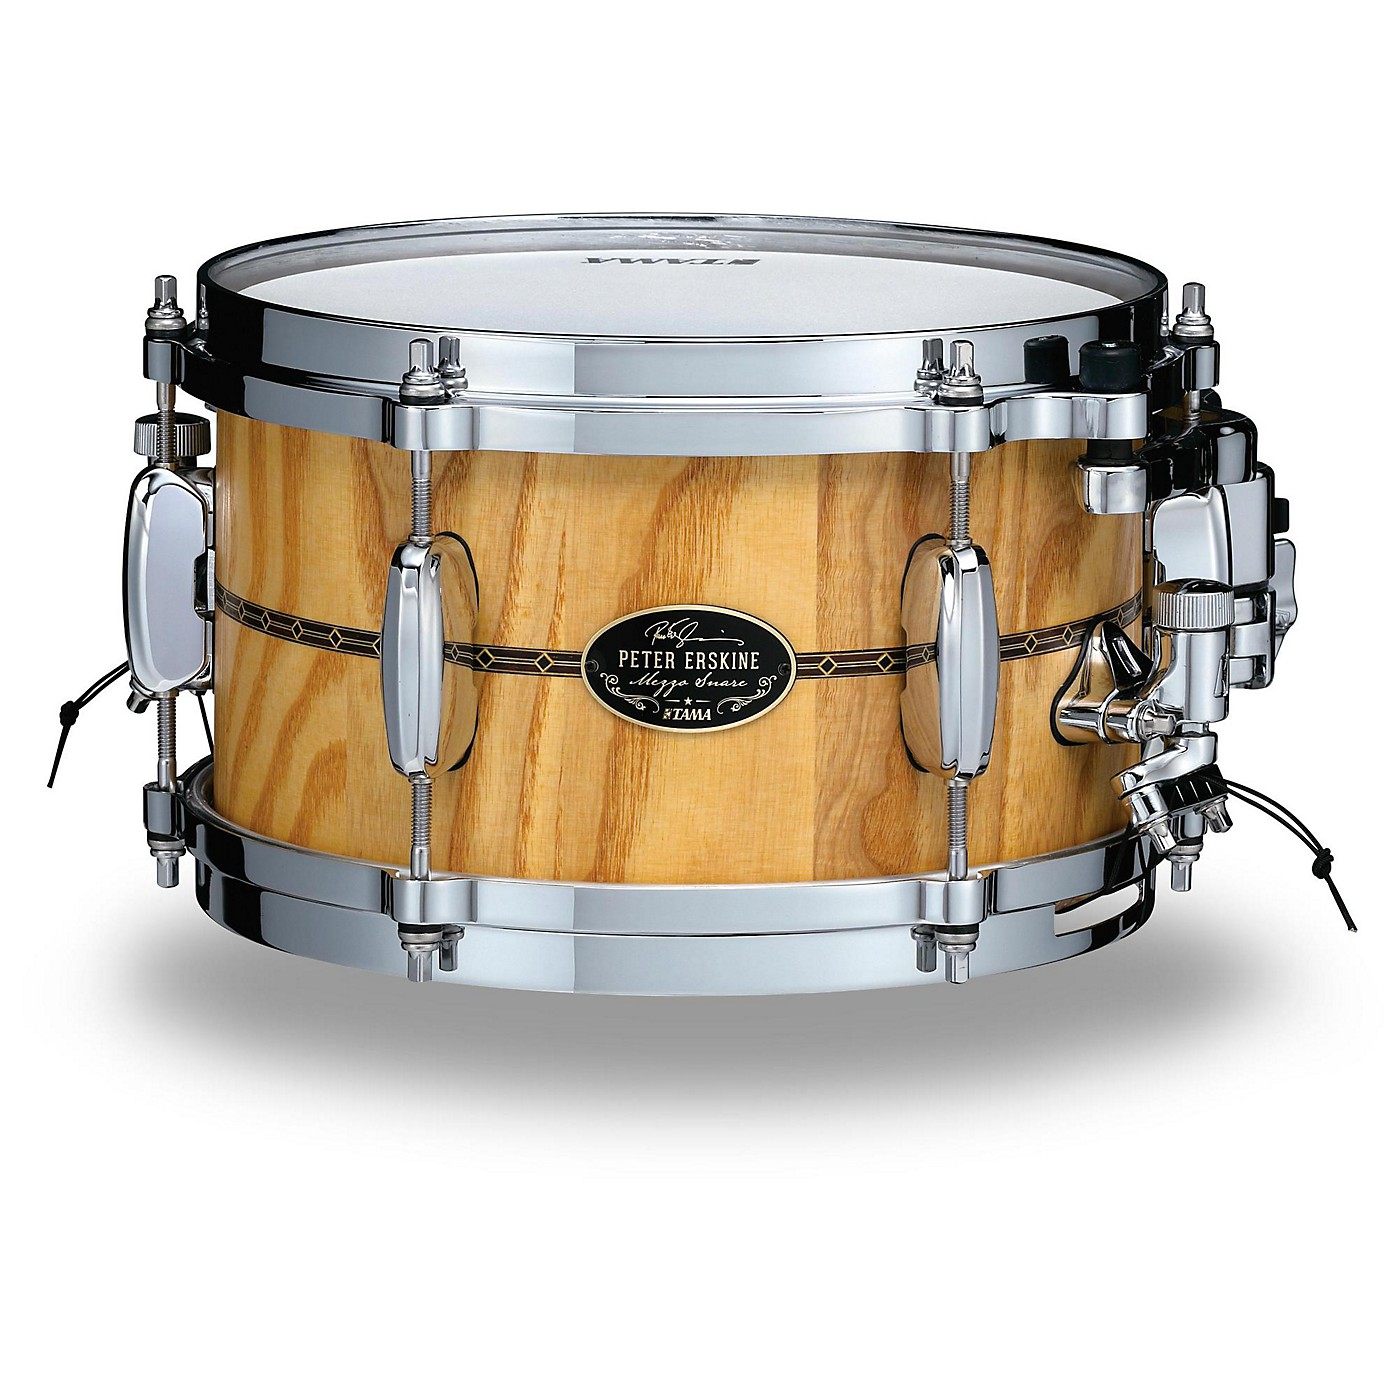 TAMA Peter Erskine Signature Snare Drum thumbnail